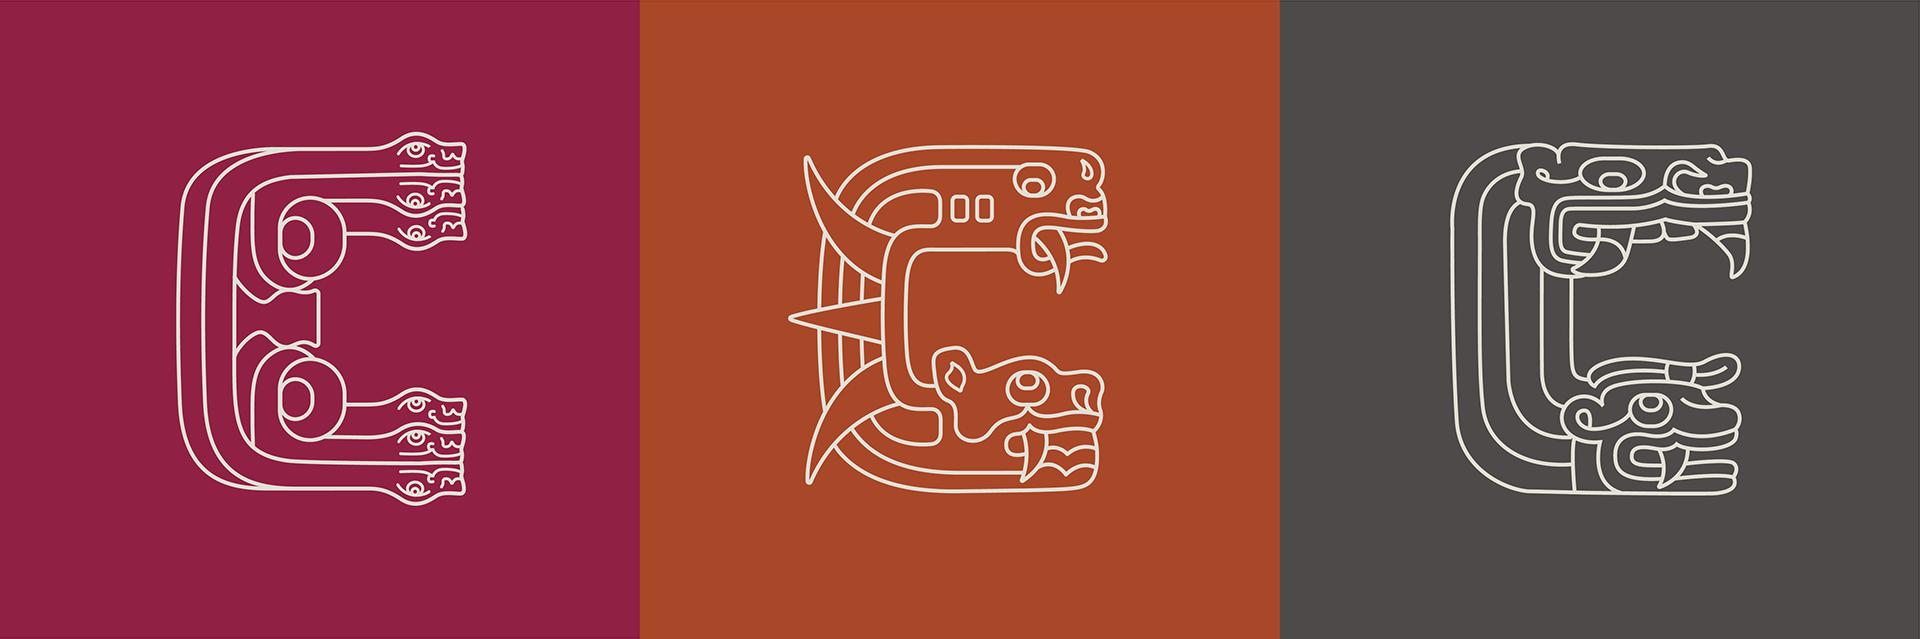 Visual identity for Chavin, ancient Peruvian Culture